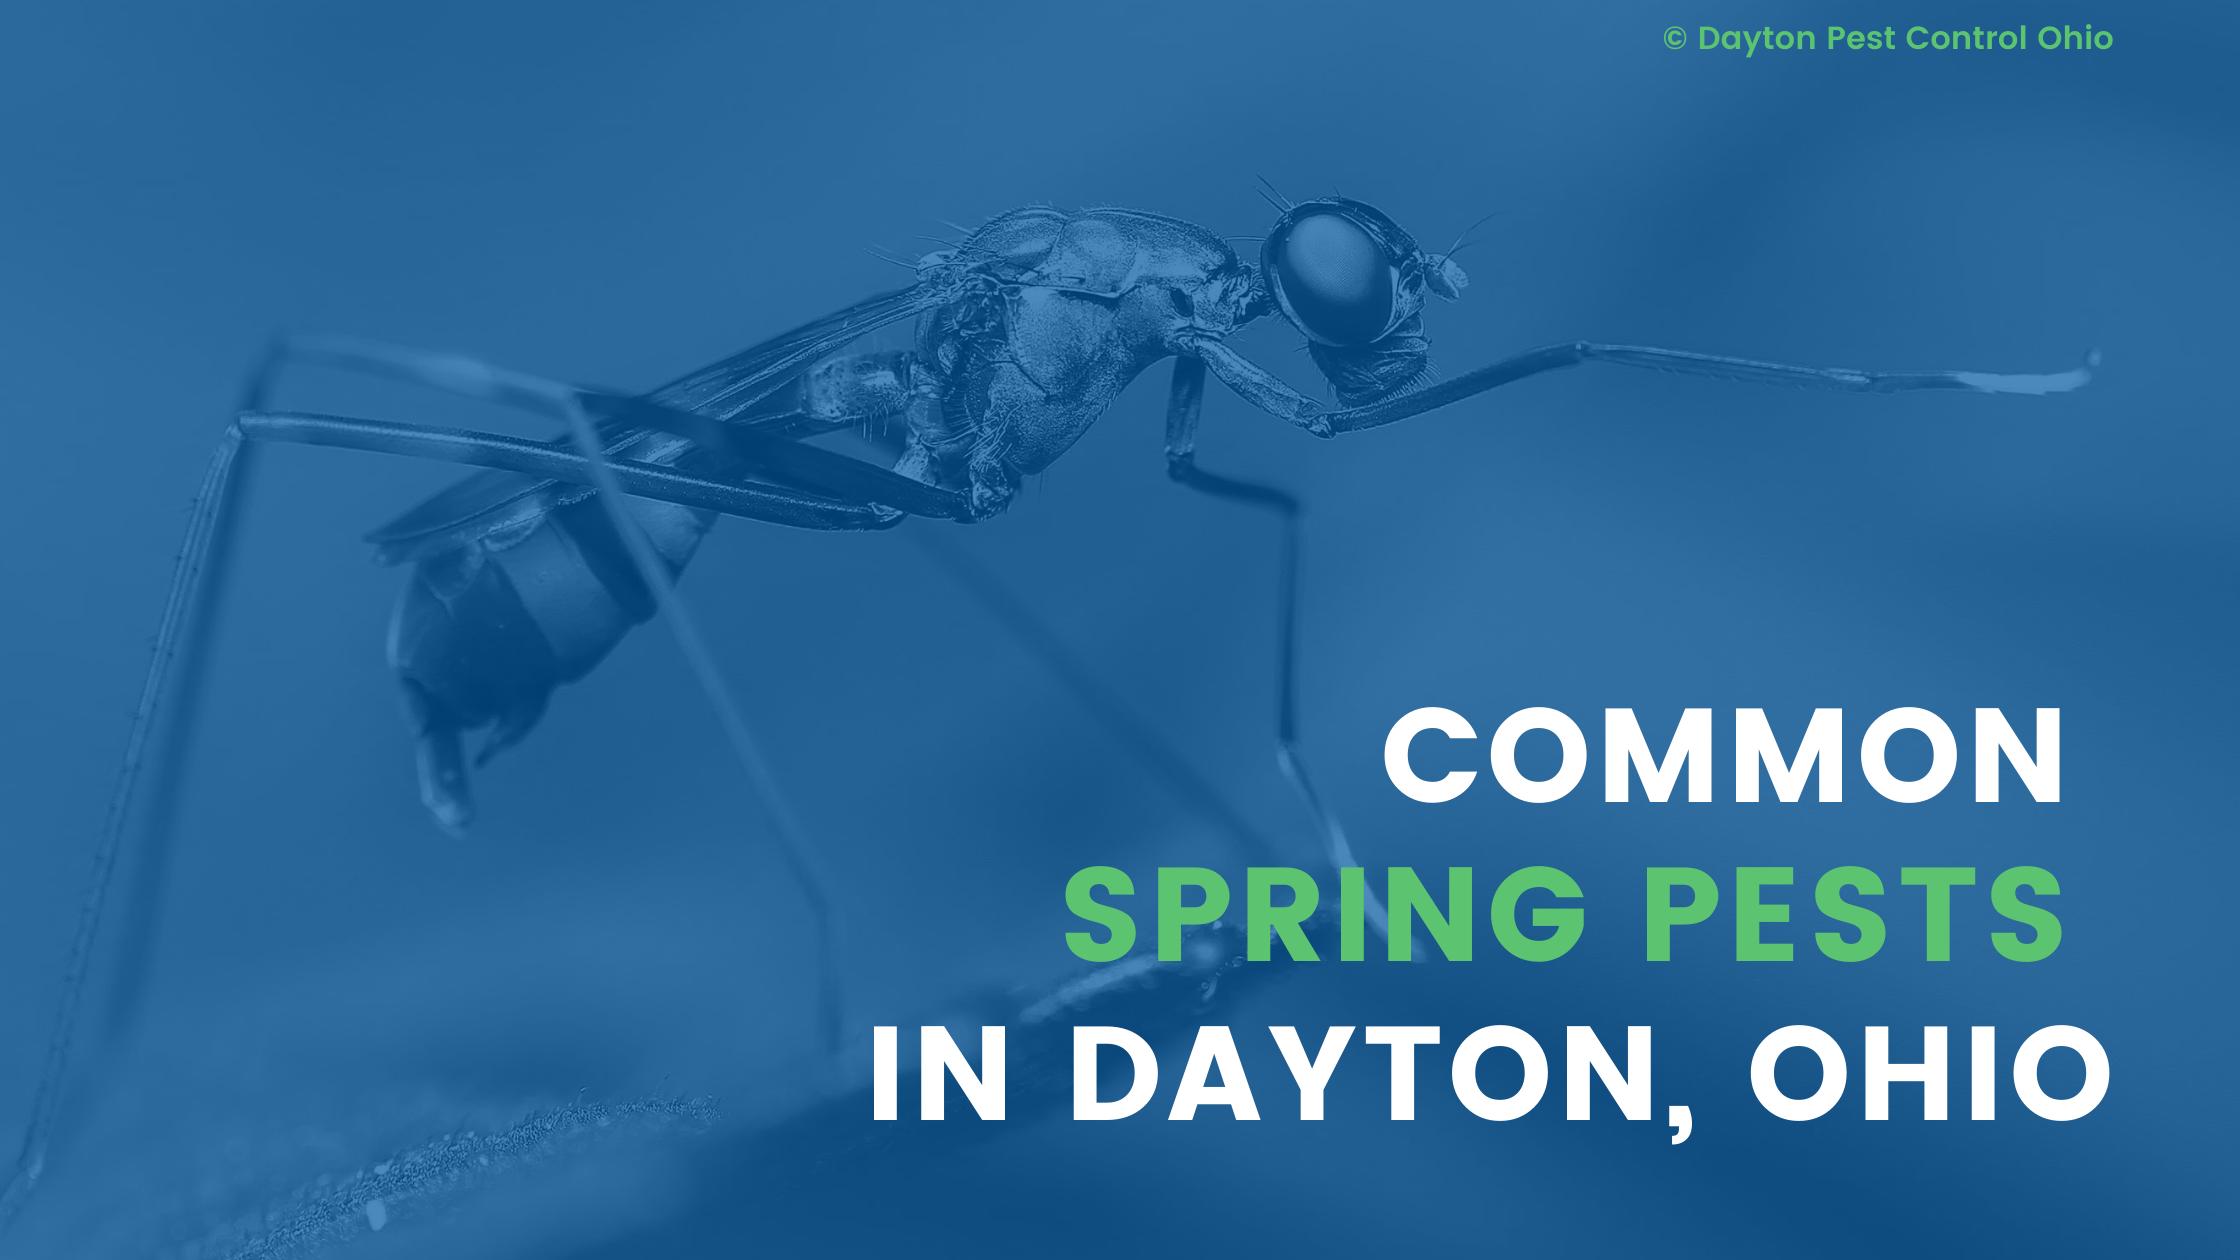 Pest Control Dayton Ohio - Common Spring Pests